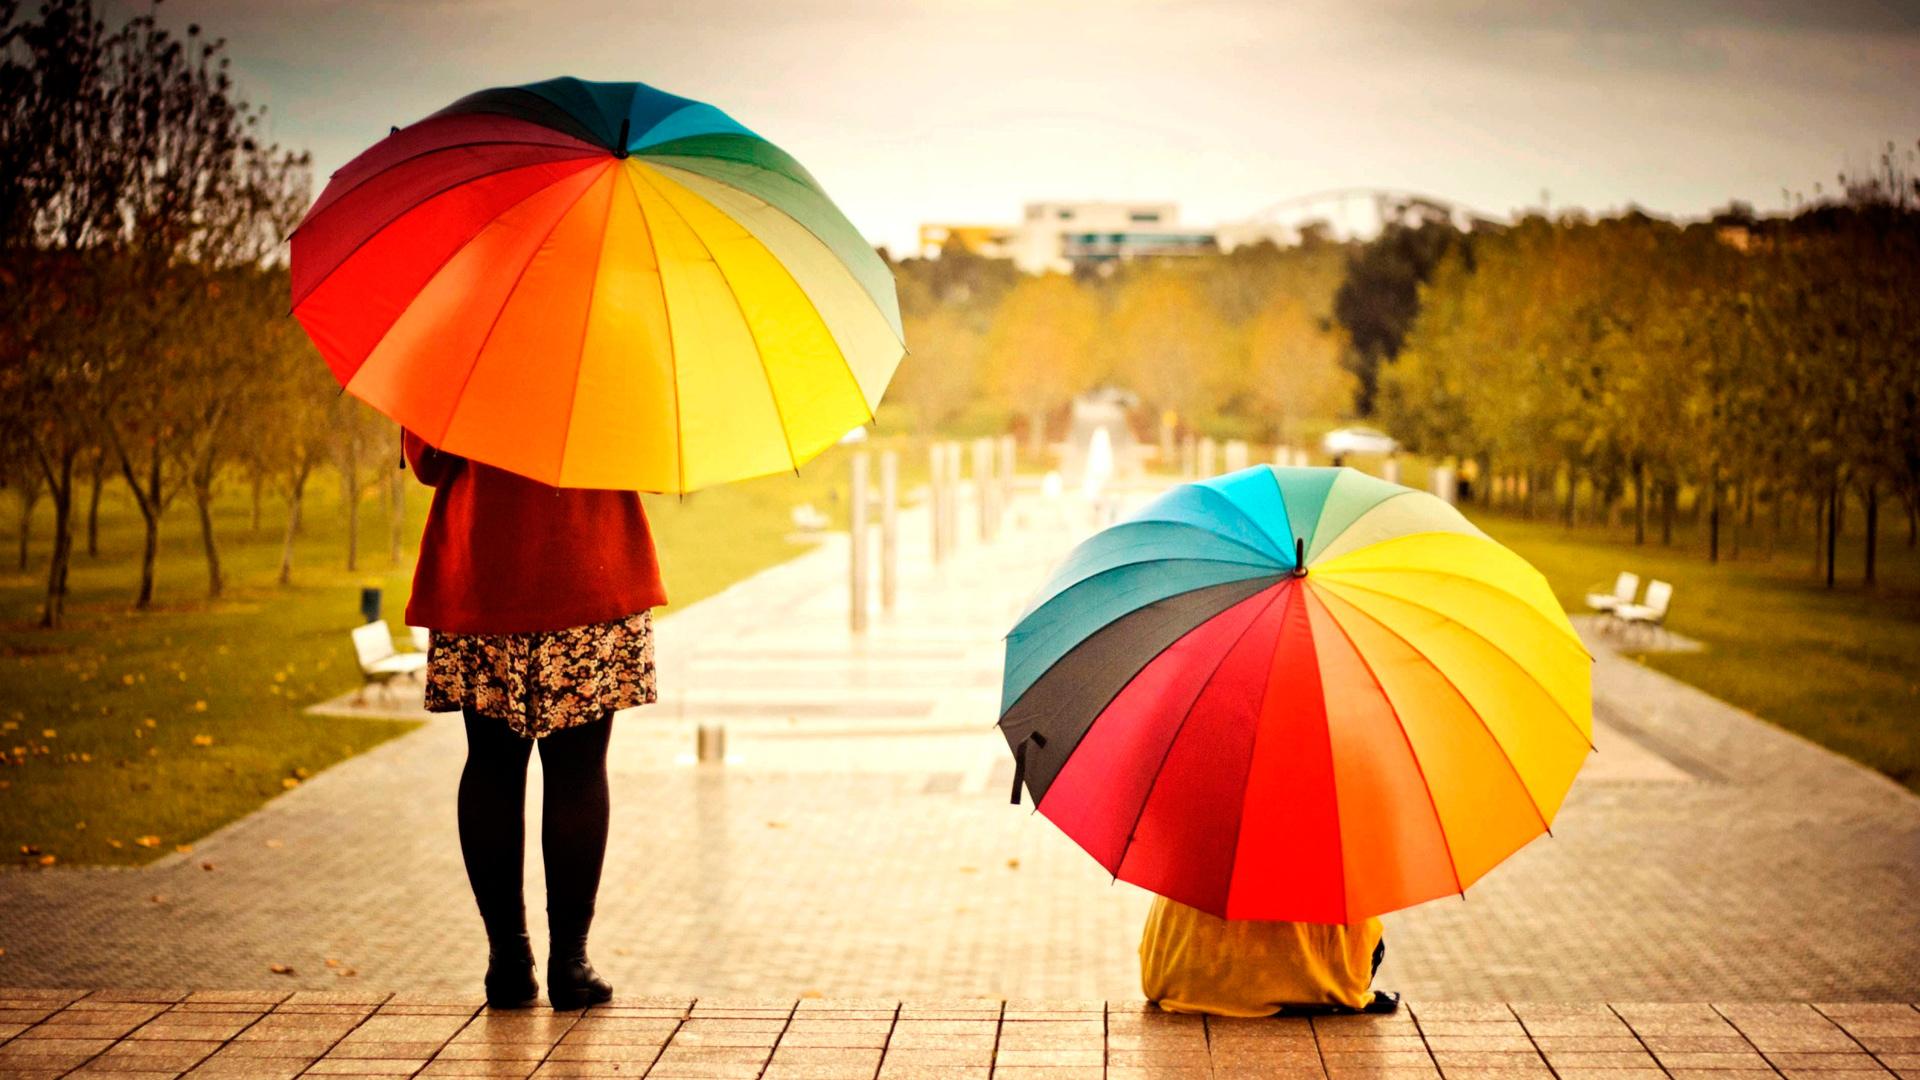 два ярких зонта